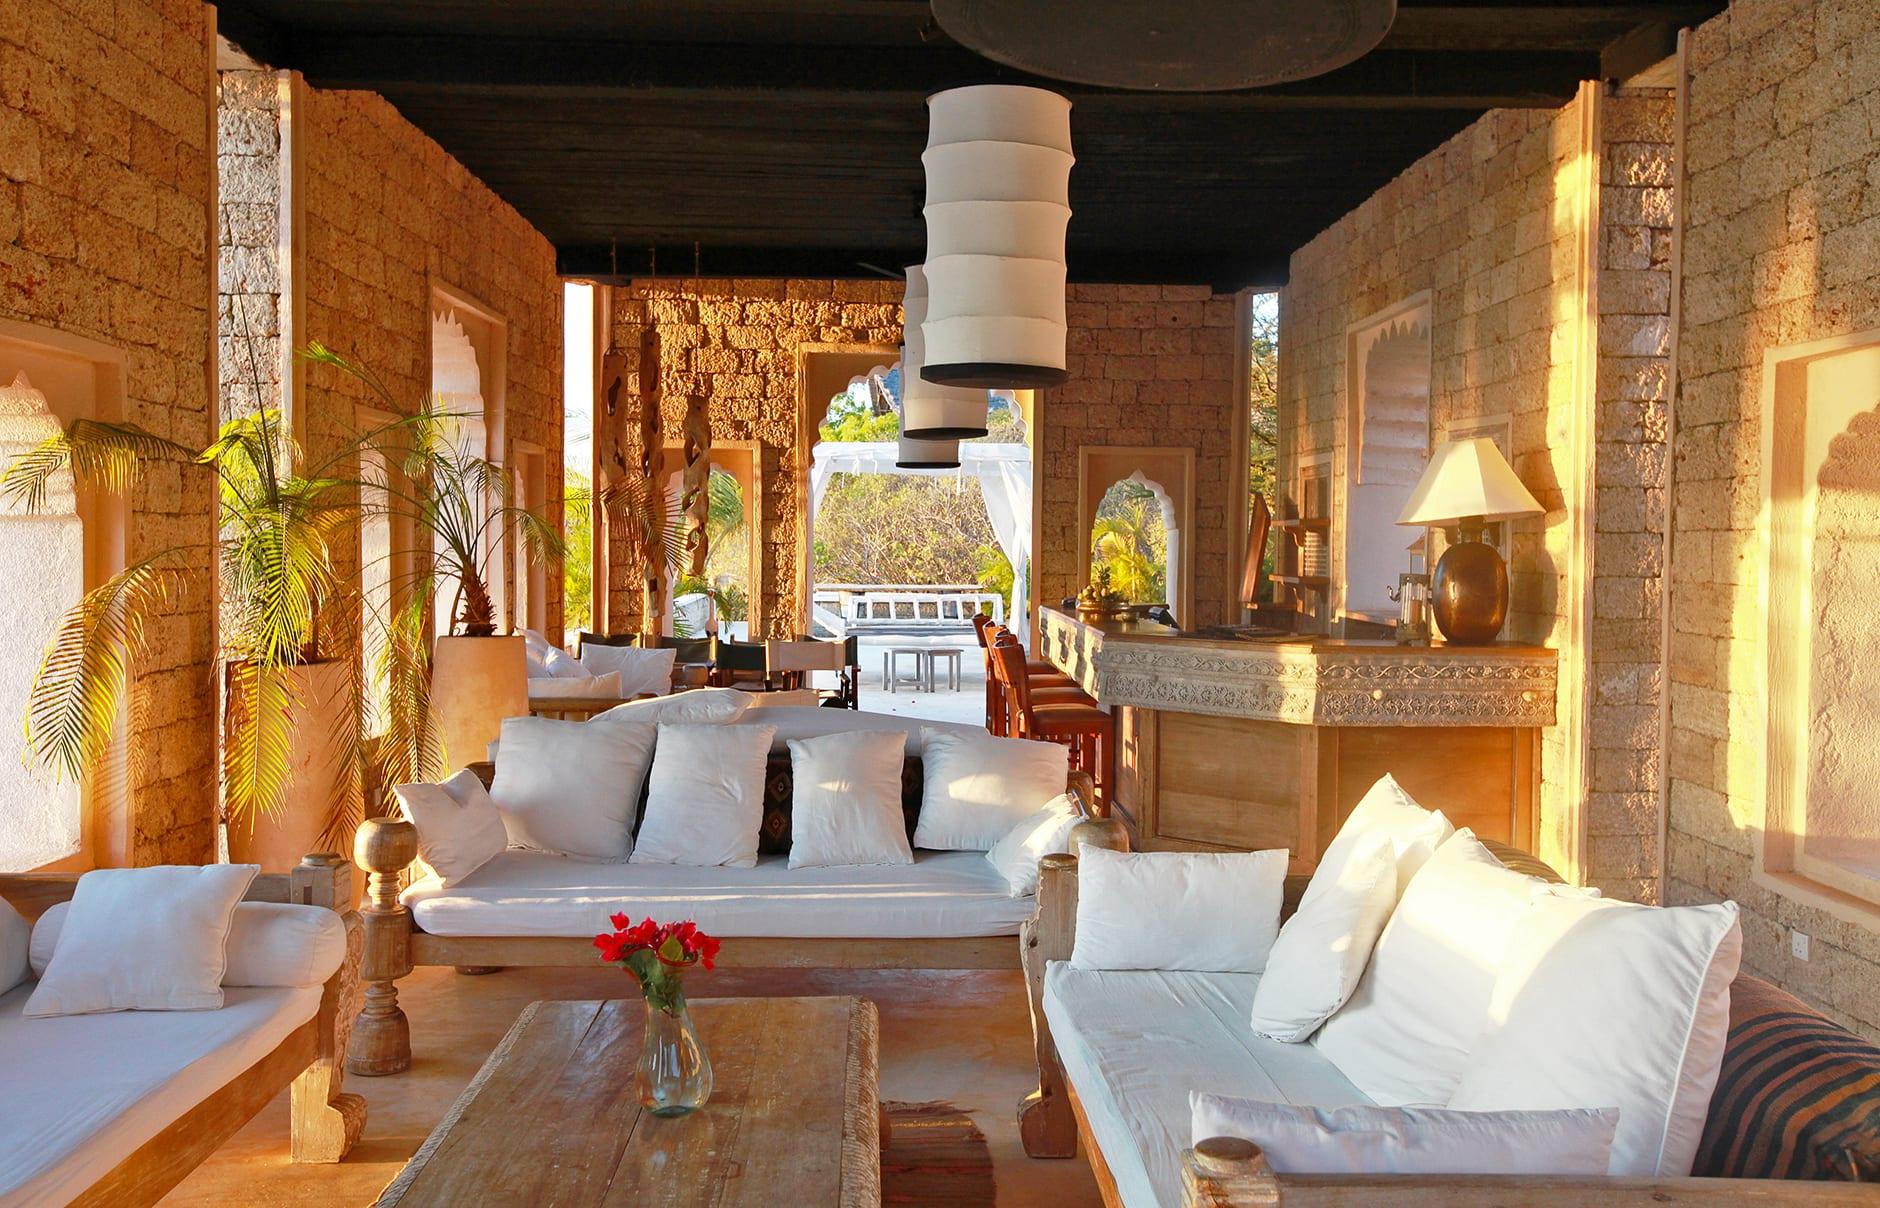 The Majlis, Lamu, Kenya. Hotel Review by TravelPlusStyle. Photo © The Majlis Hotel